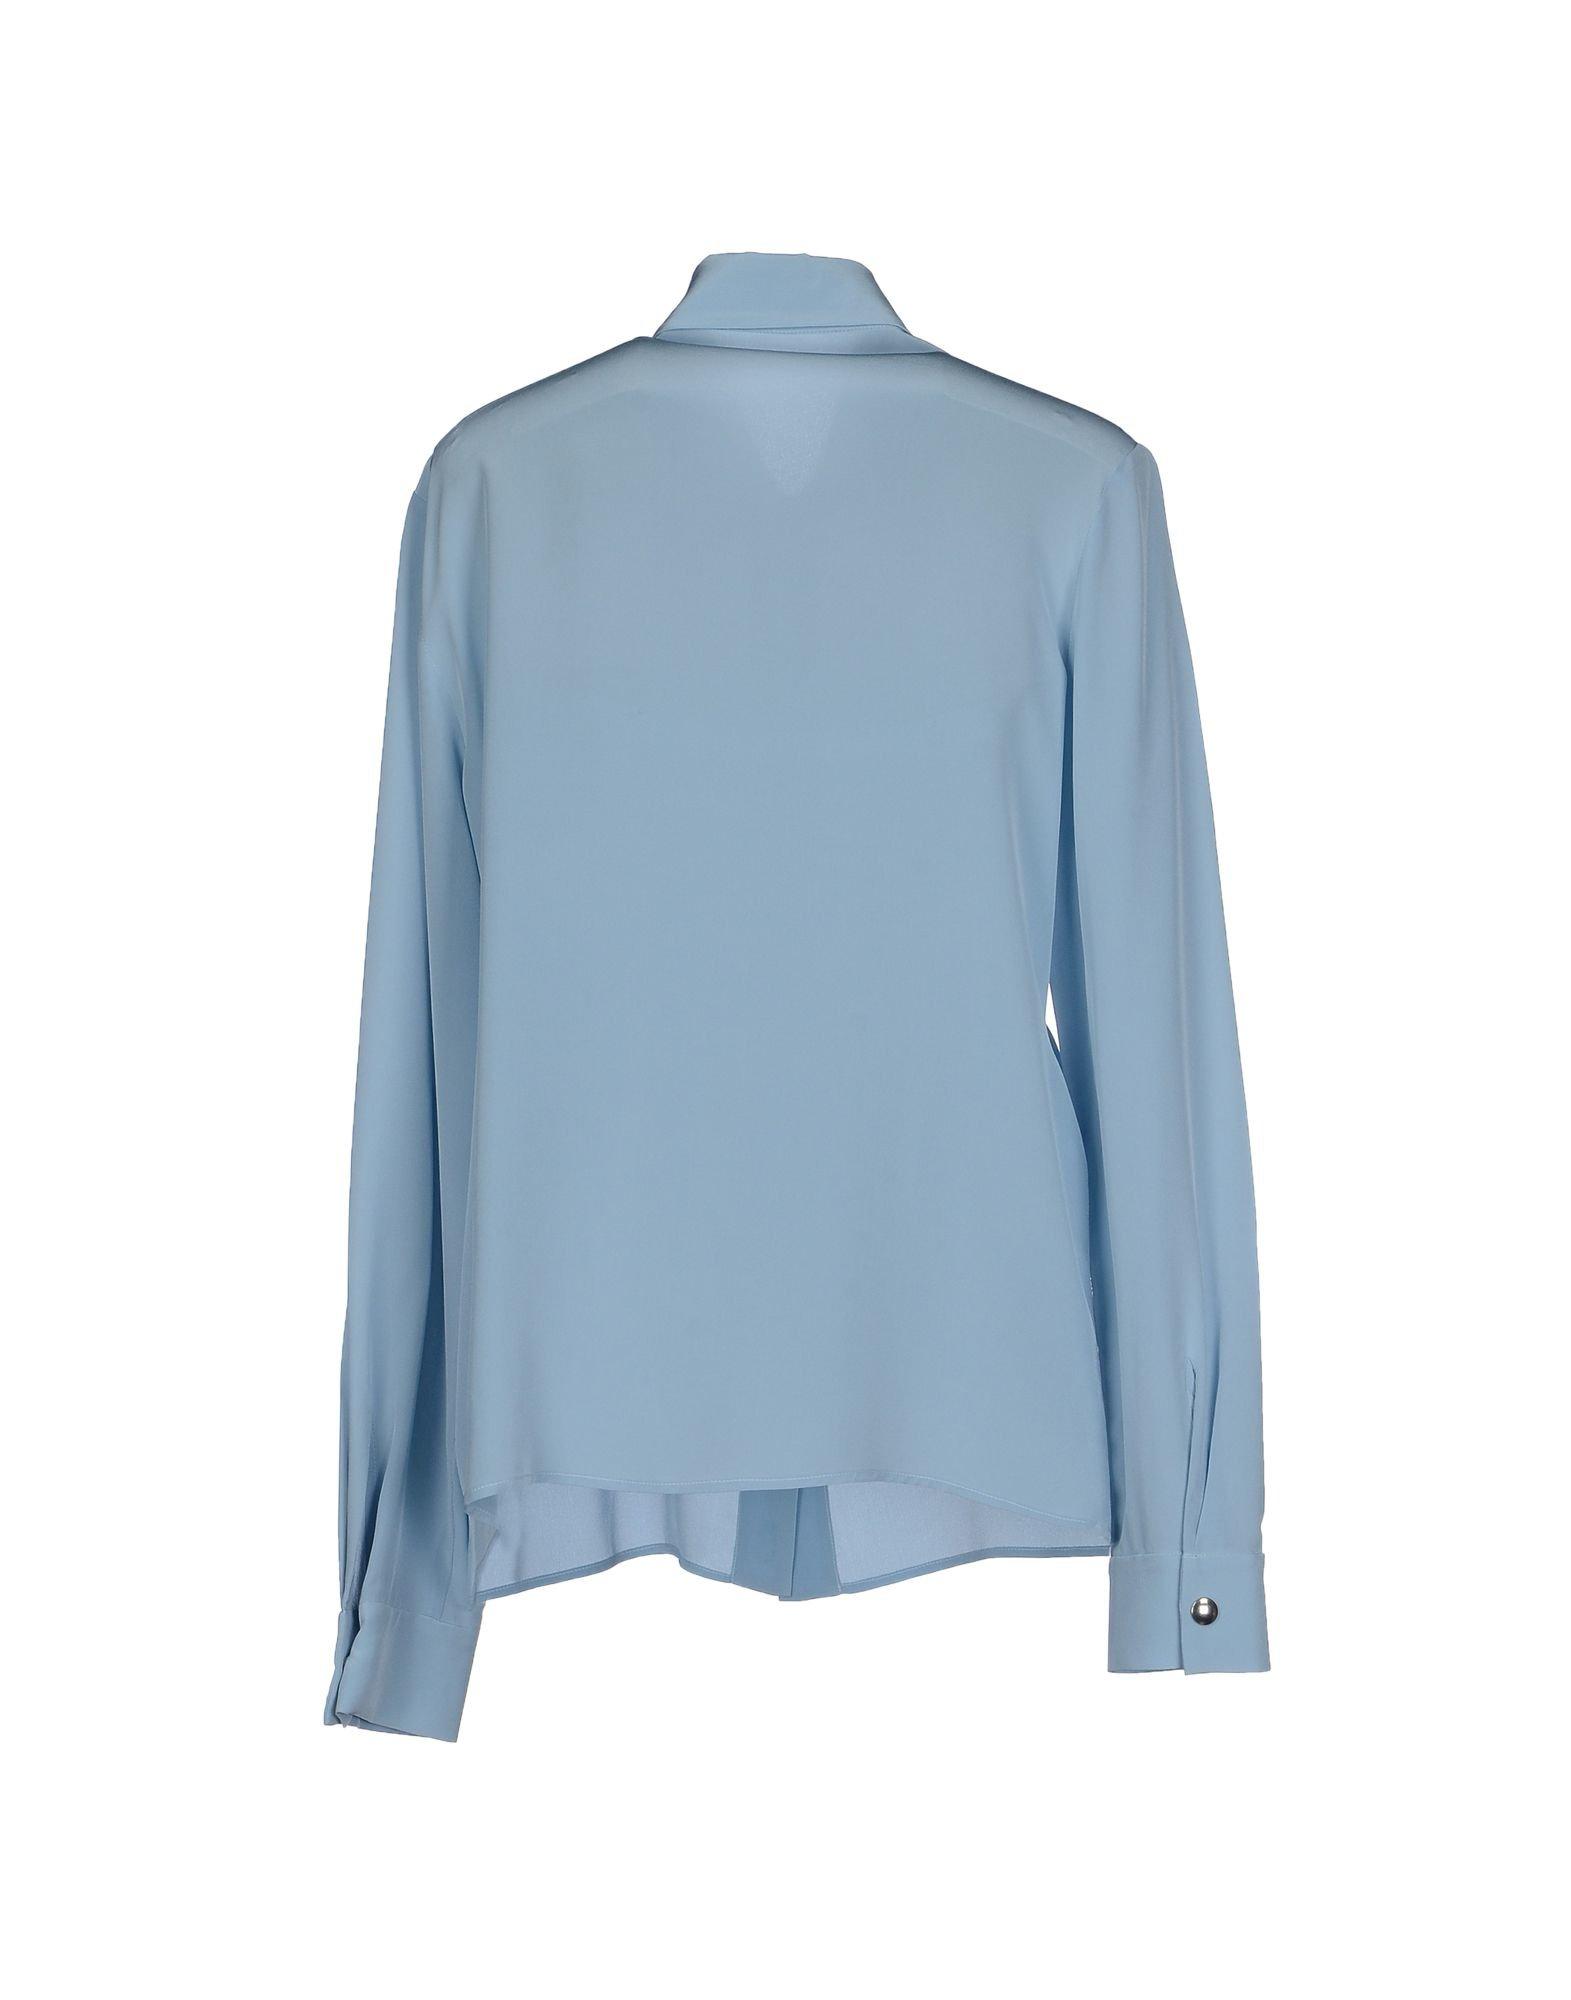 Lyst miu miu shirt in blue for Miu miu t shirt